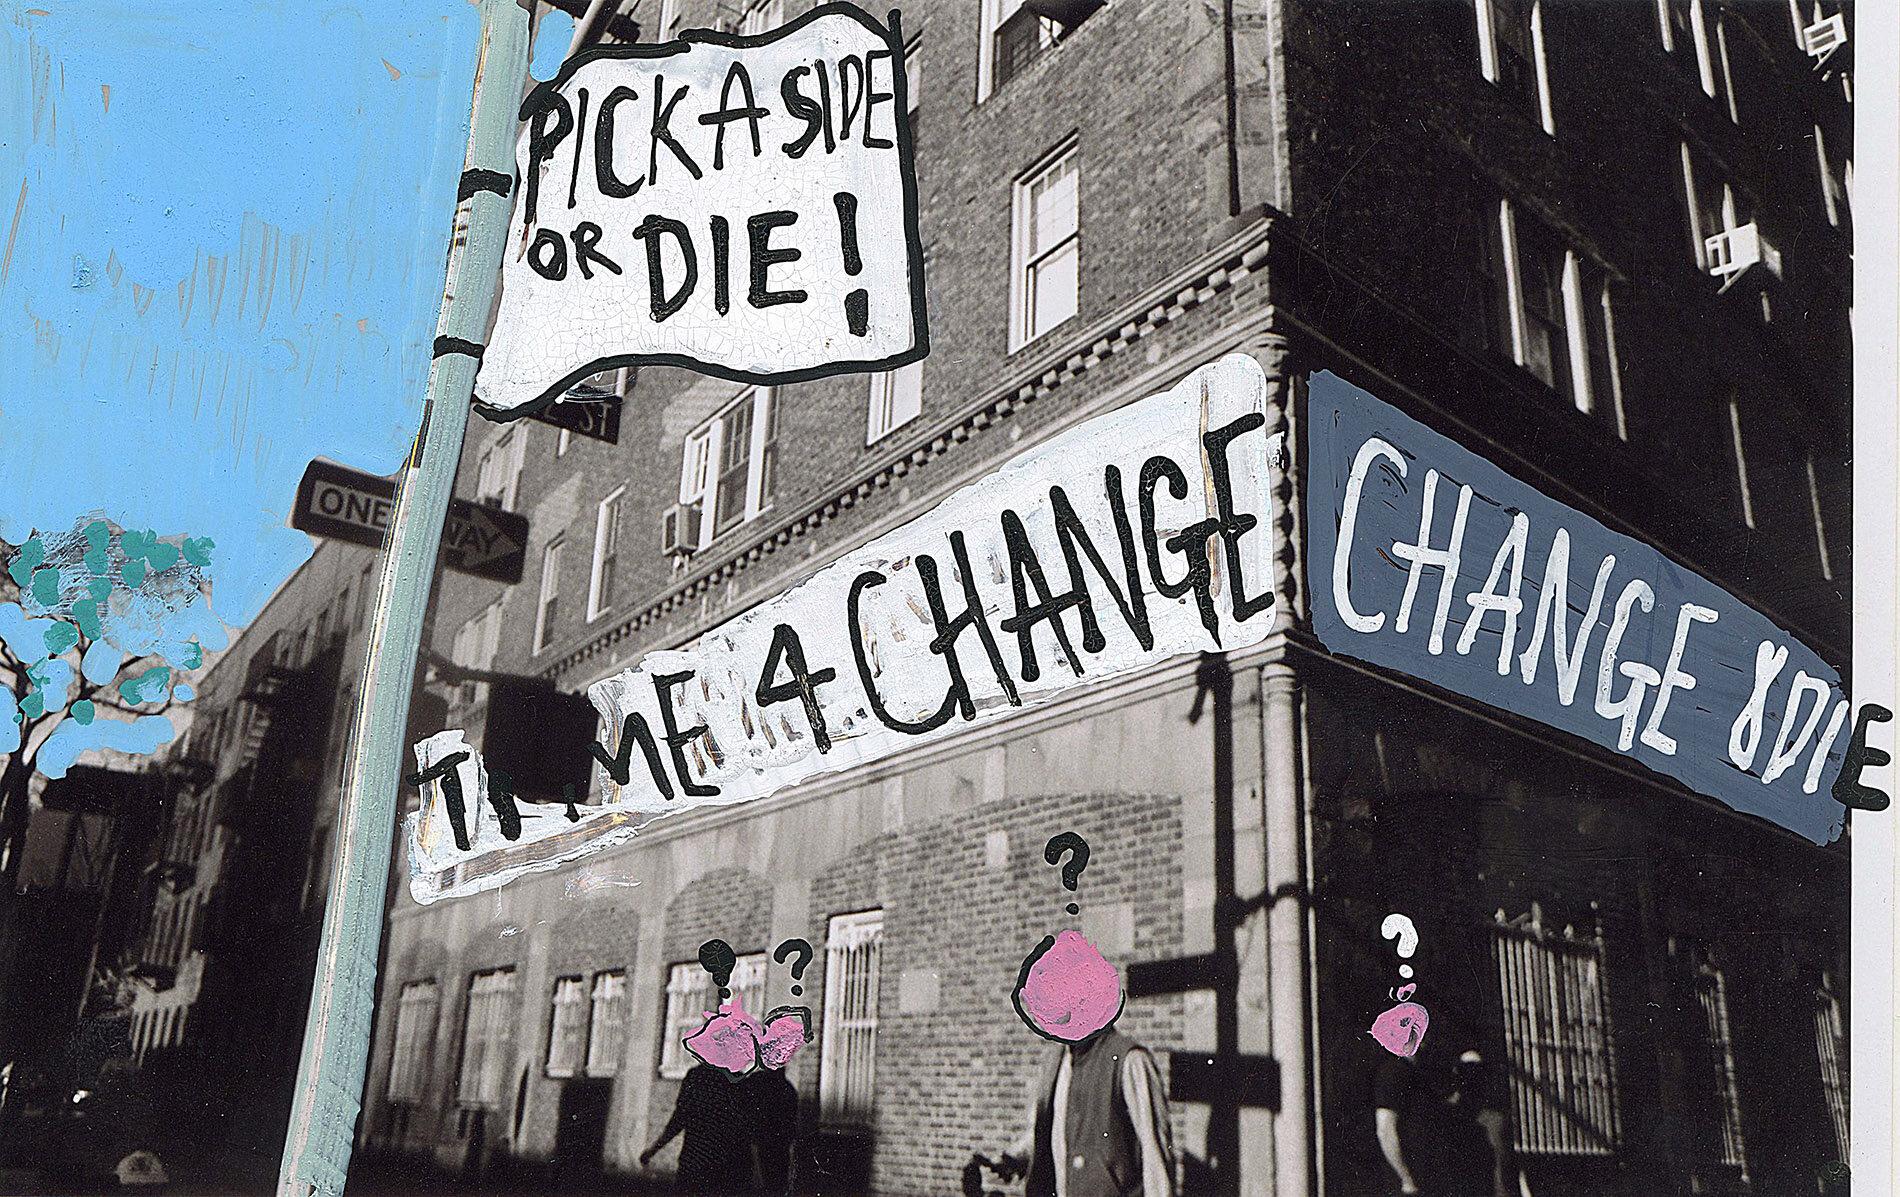 'Change or Die' 2015, Berlin, Inkjet photograph & Acrylic, 10x15cm